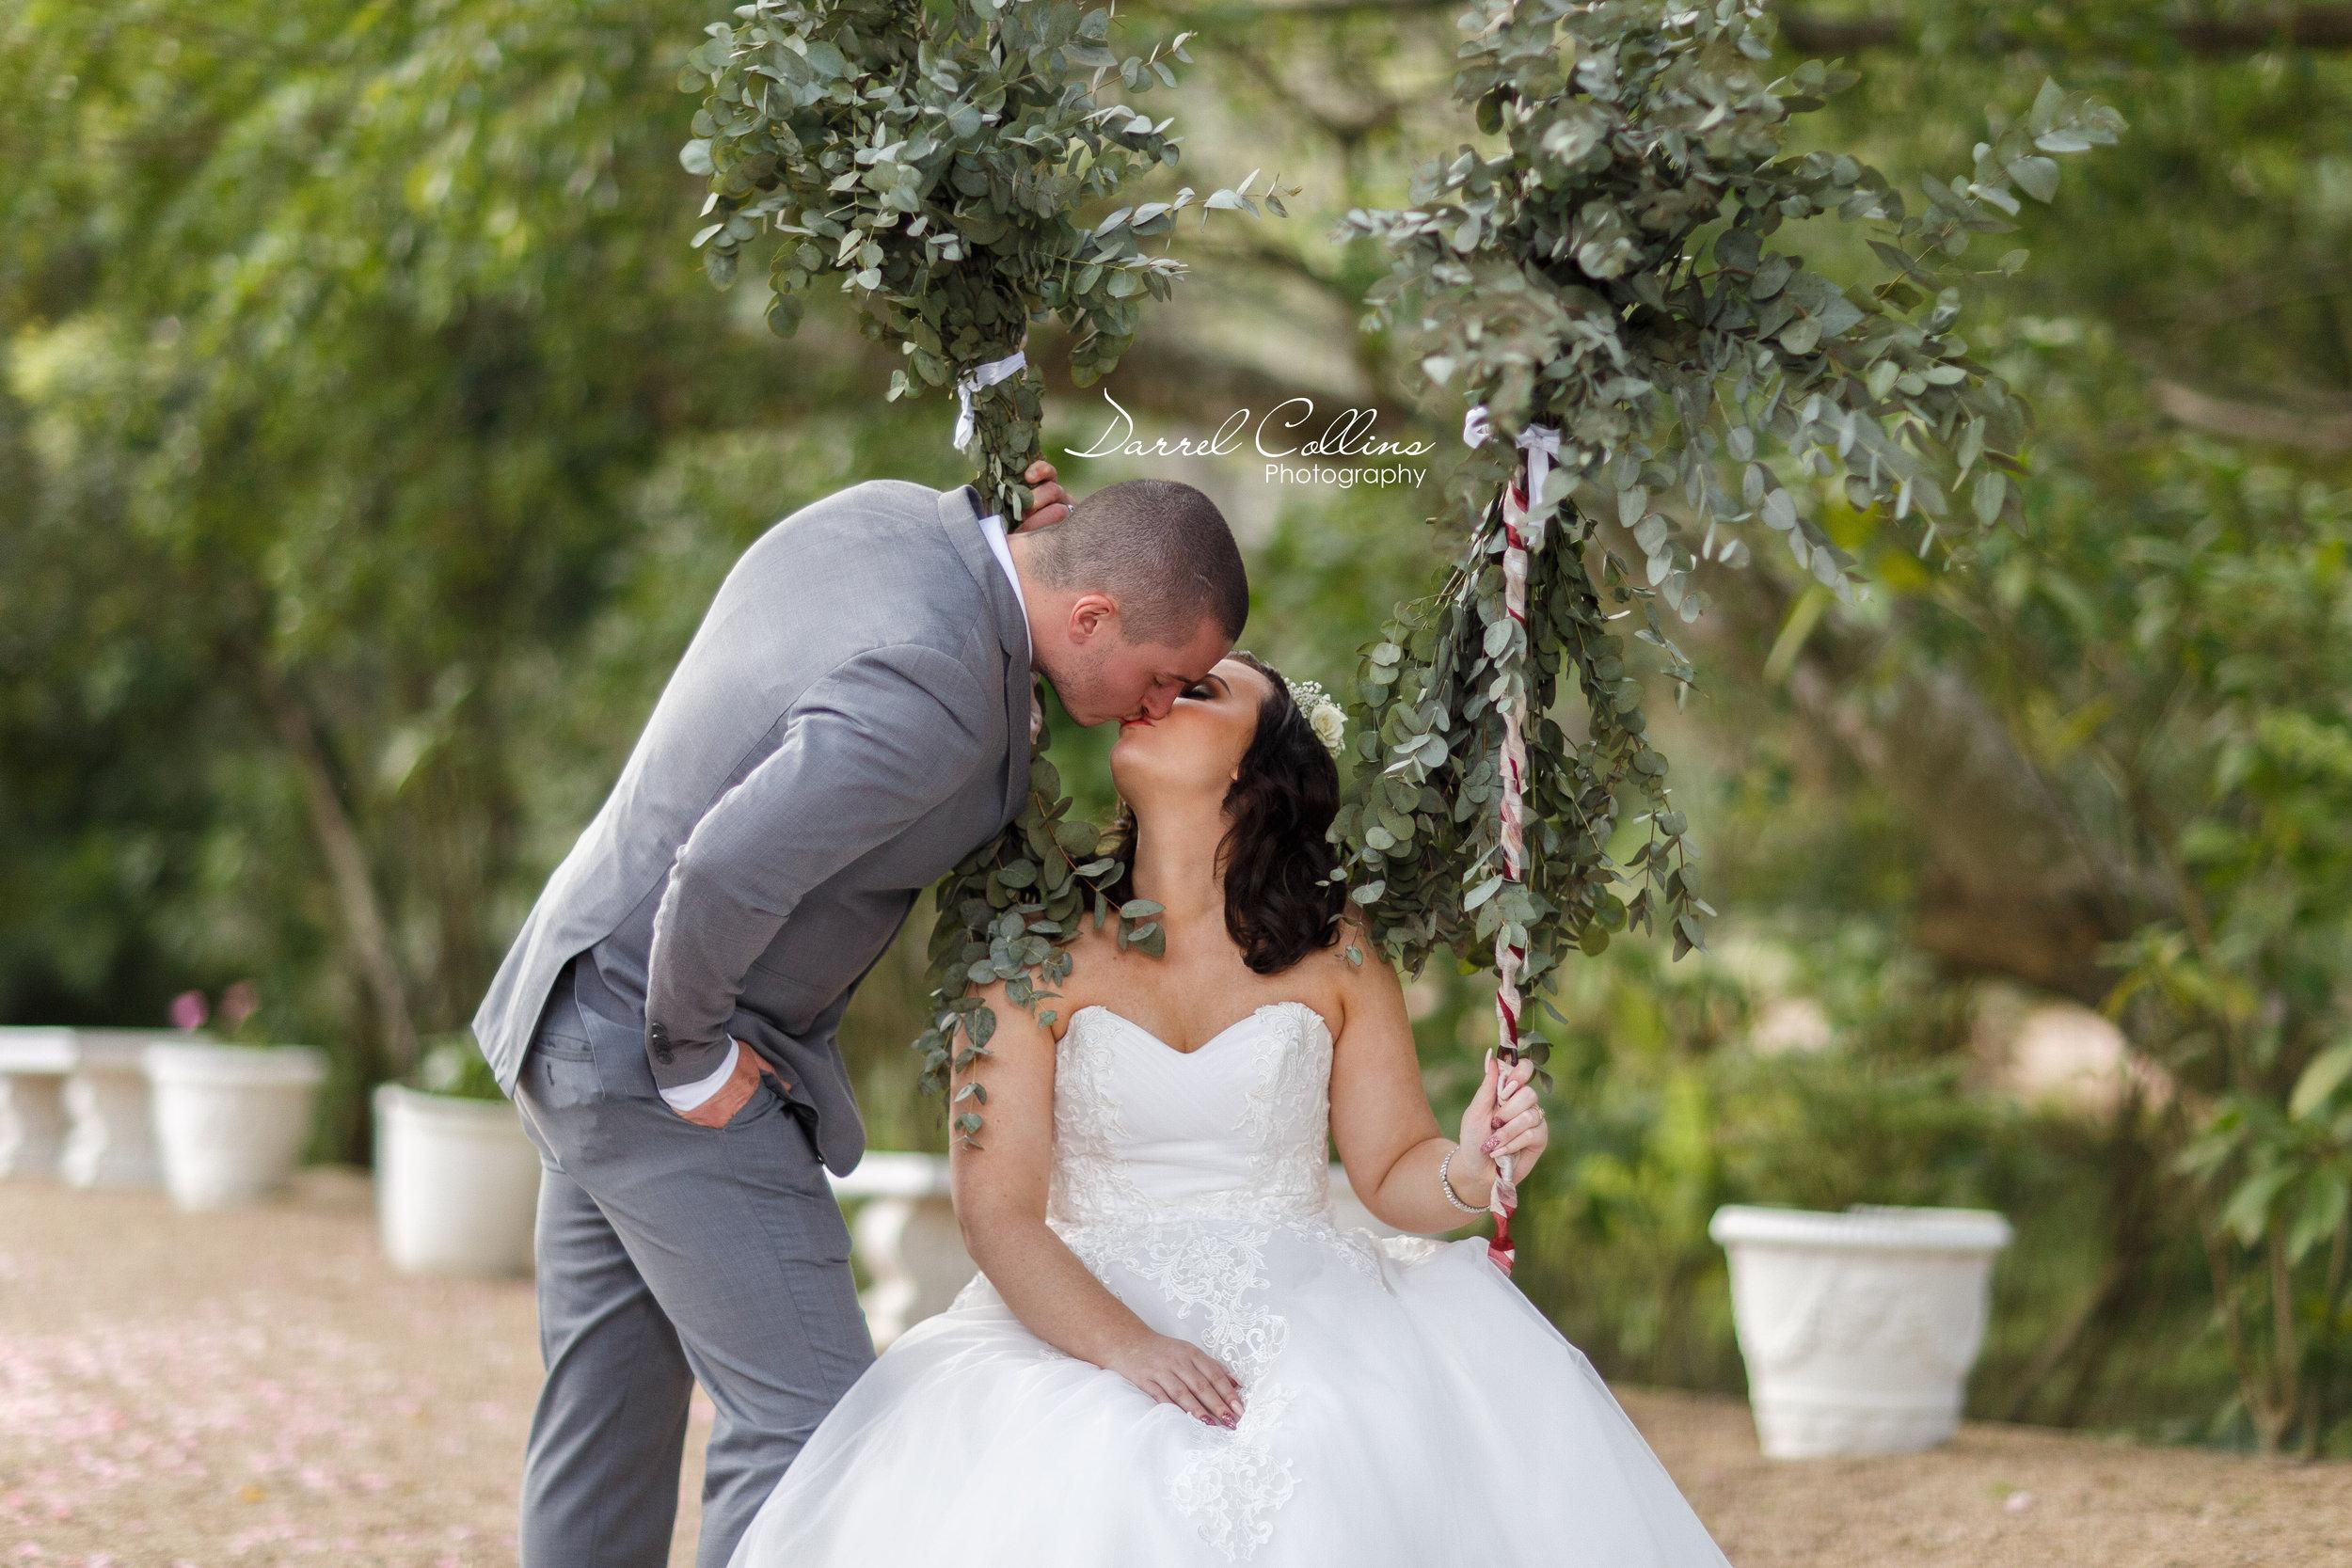 Clint and Michelle Wedding_-11.jpg